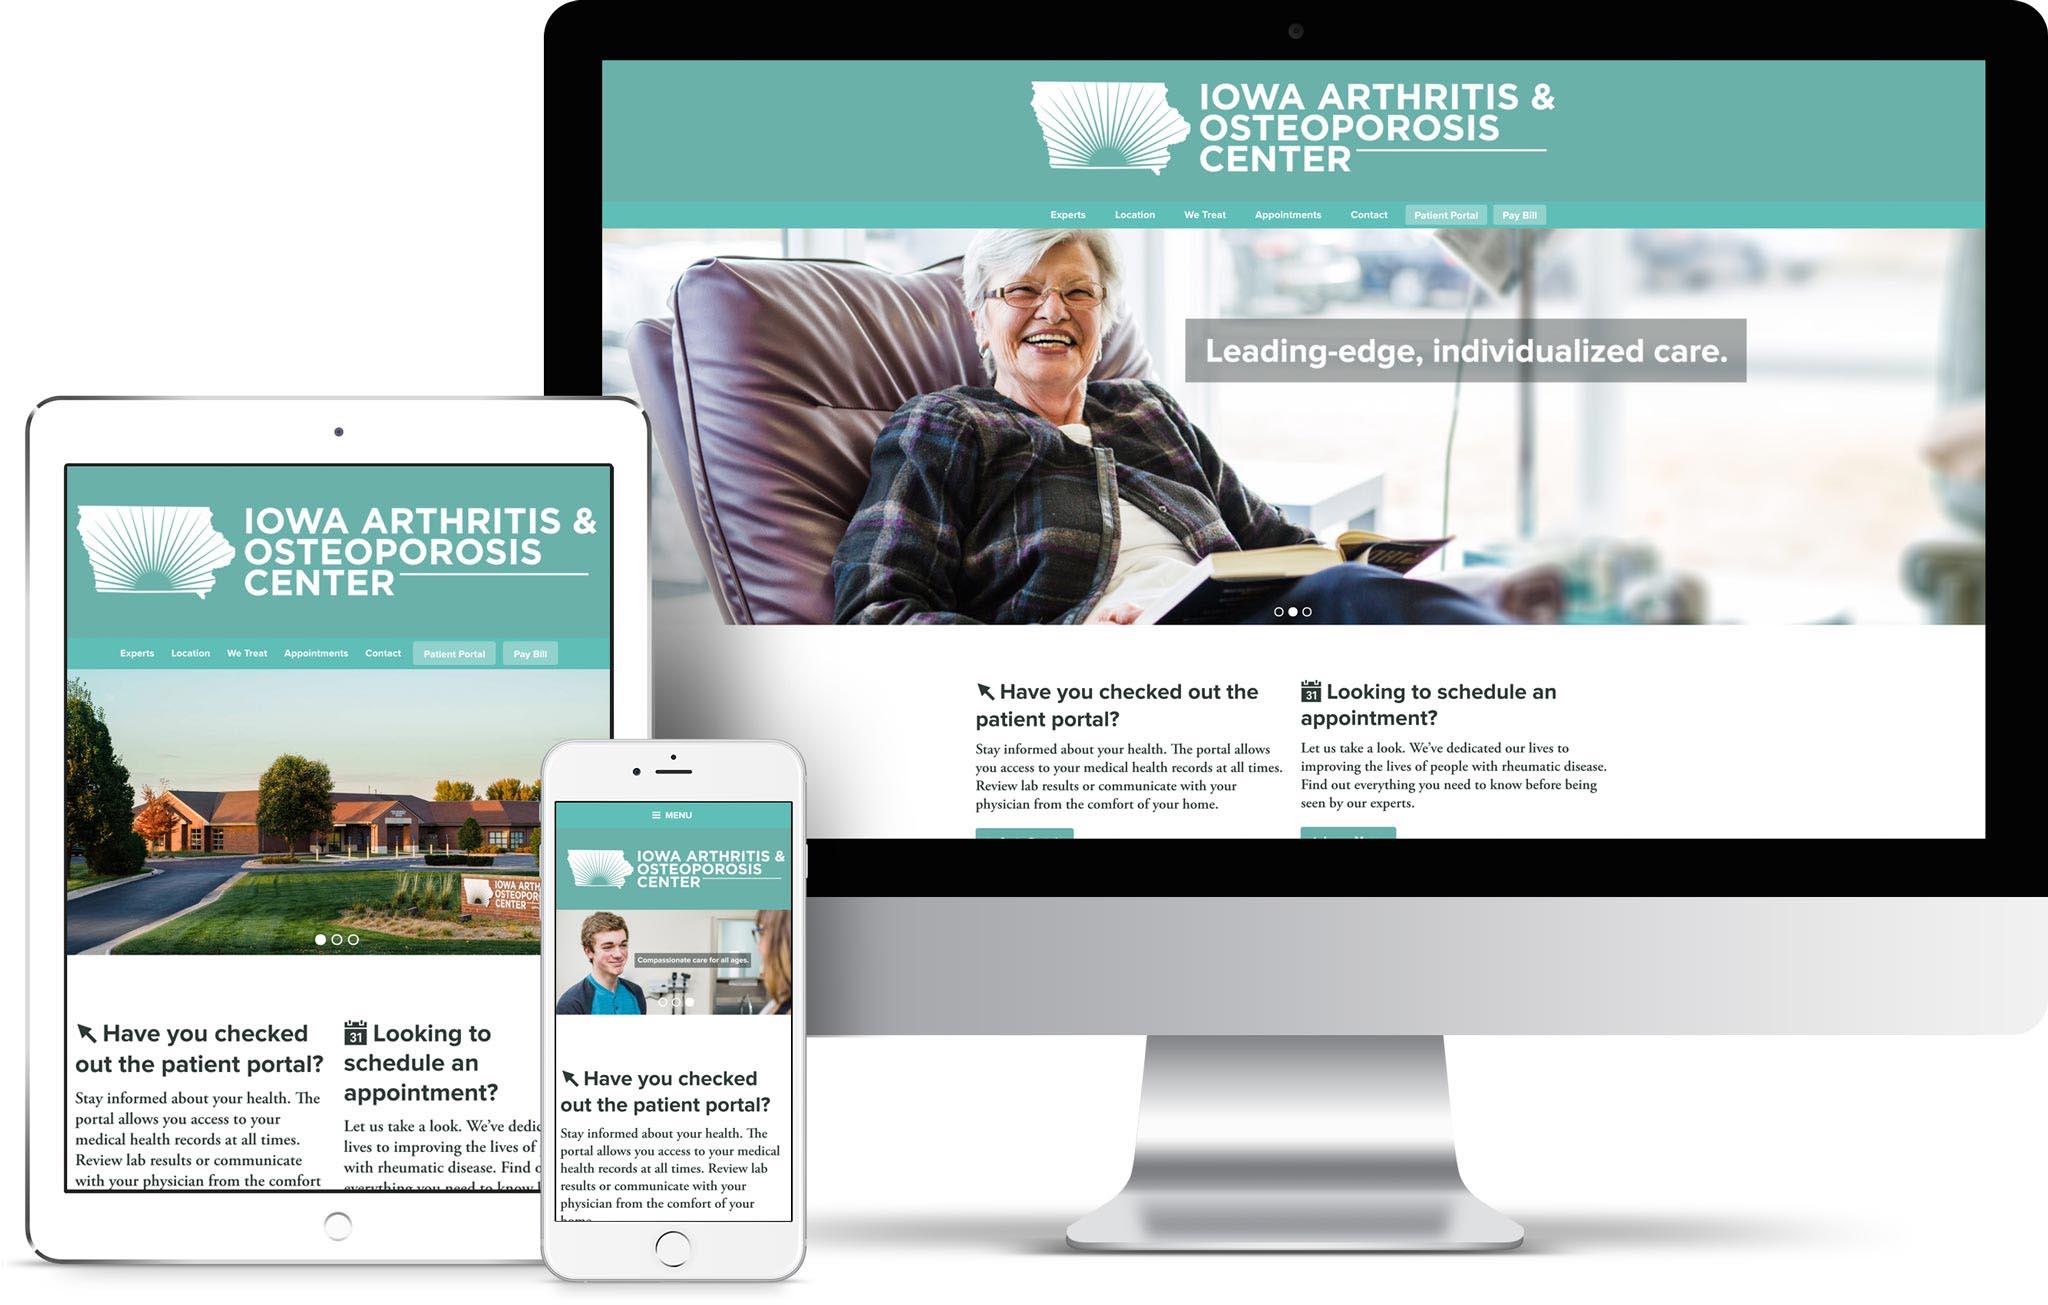 iowa-arthritis-health-care-clinic-website-design-iowa